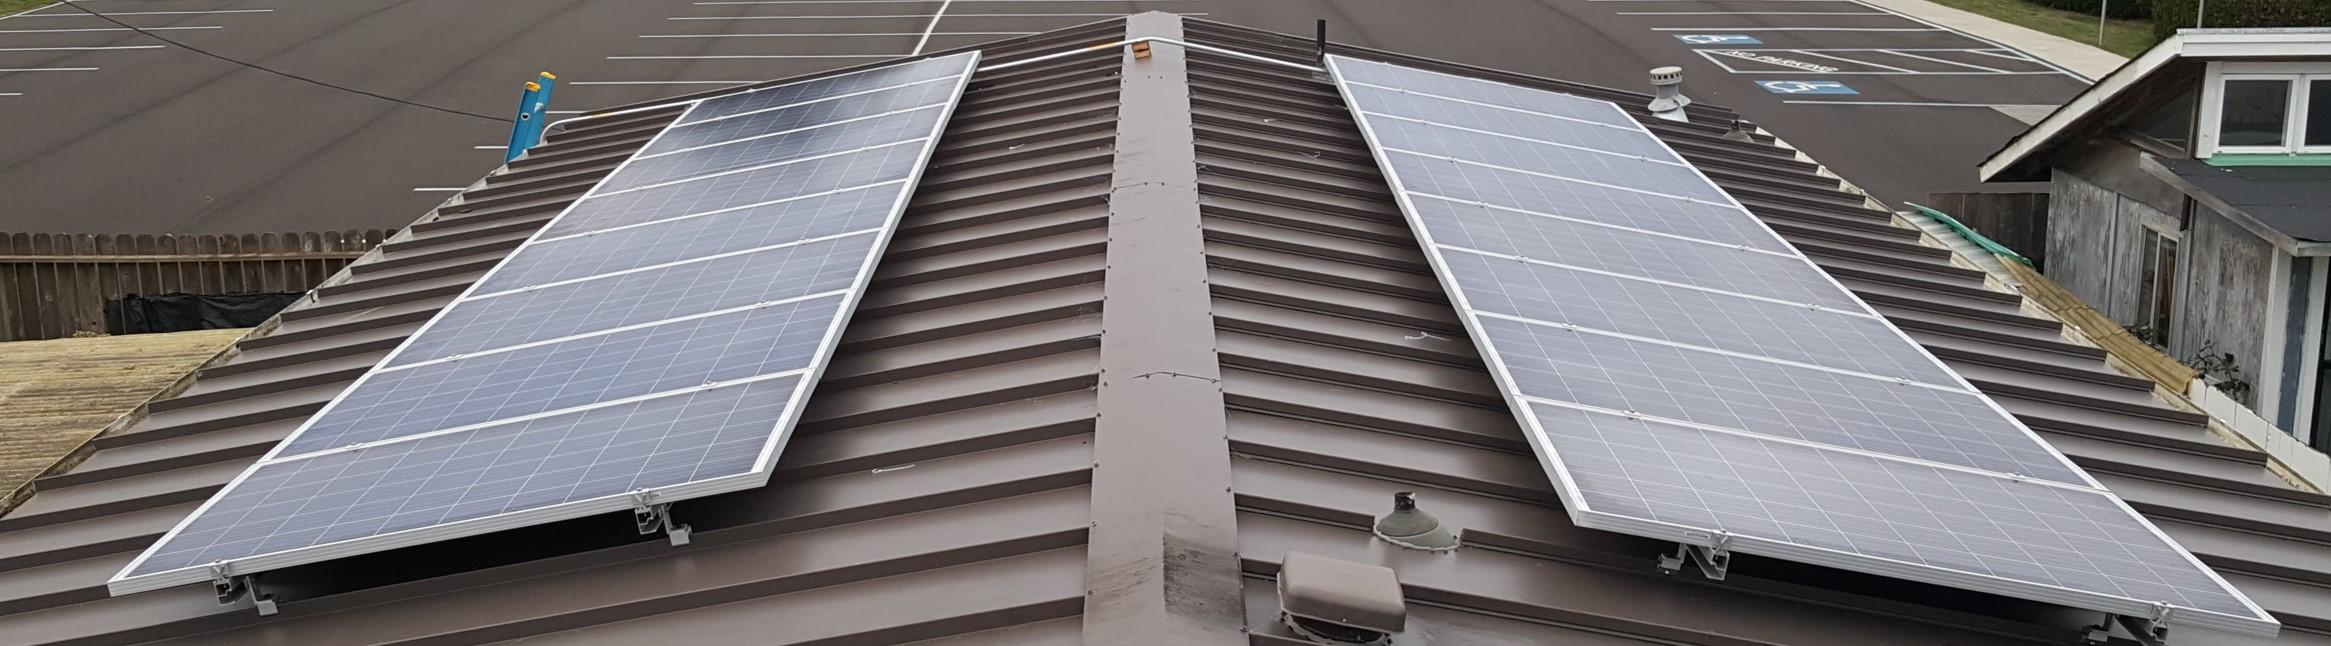 20161021.solar.metalroof